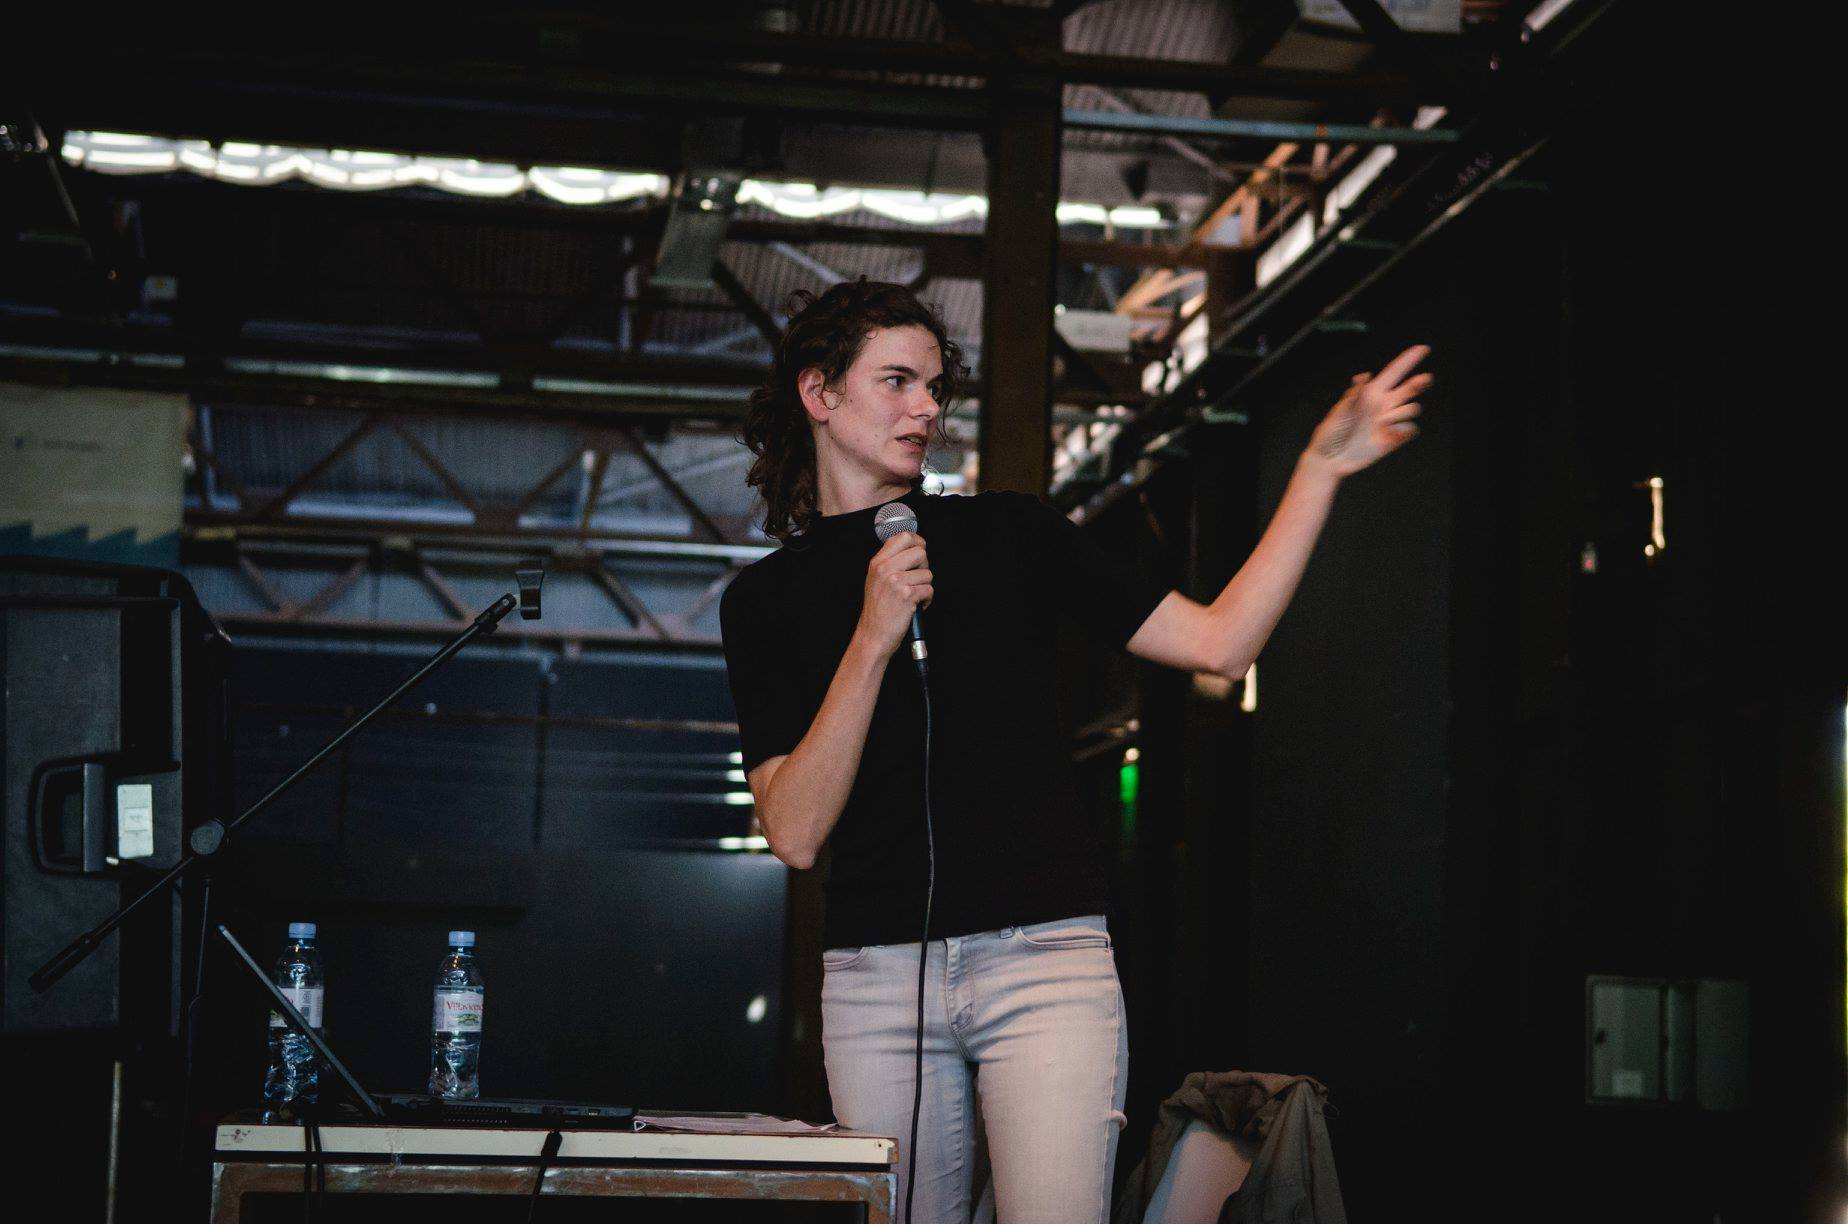 Clara Bianchi